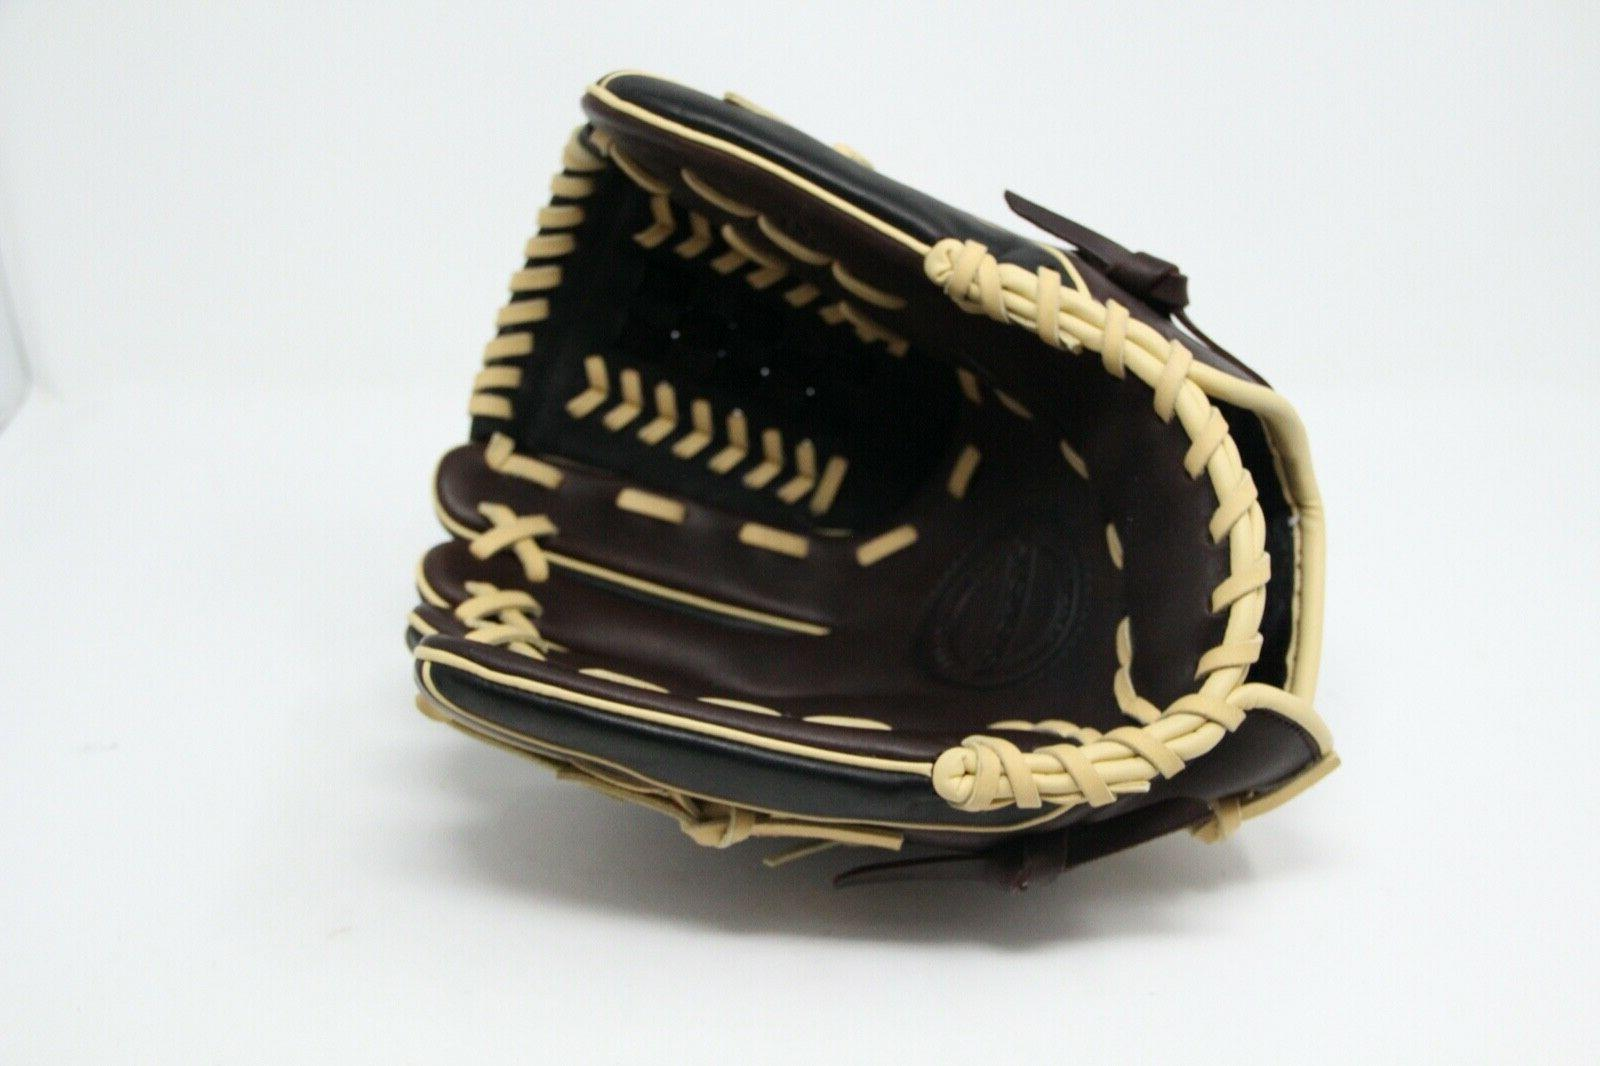 Under Pro Stock Baseball inch